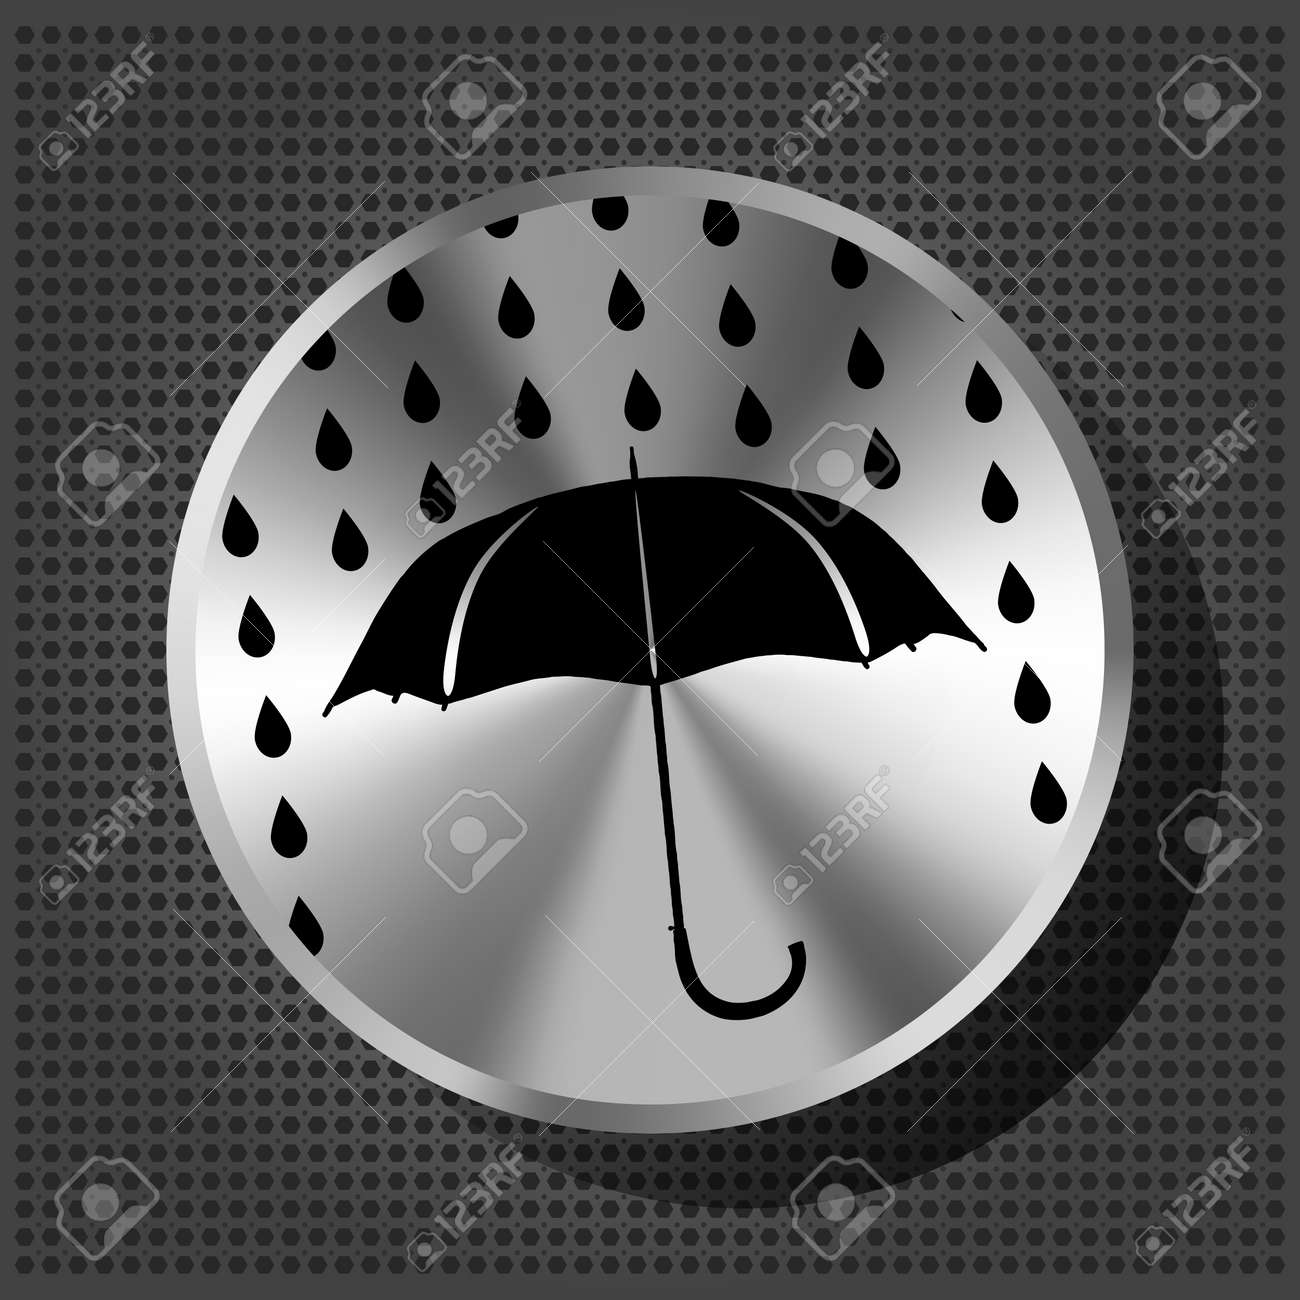 umbrella and rain drops with chrome volume knob on the metallic background Stock Vector - 16132727